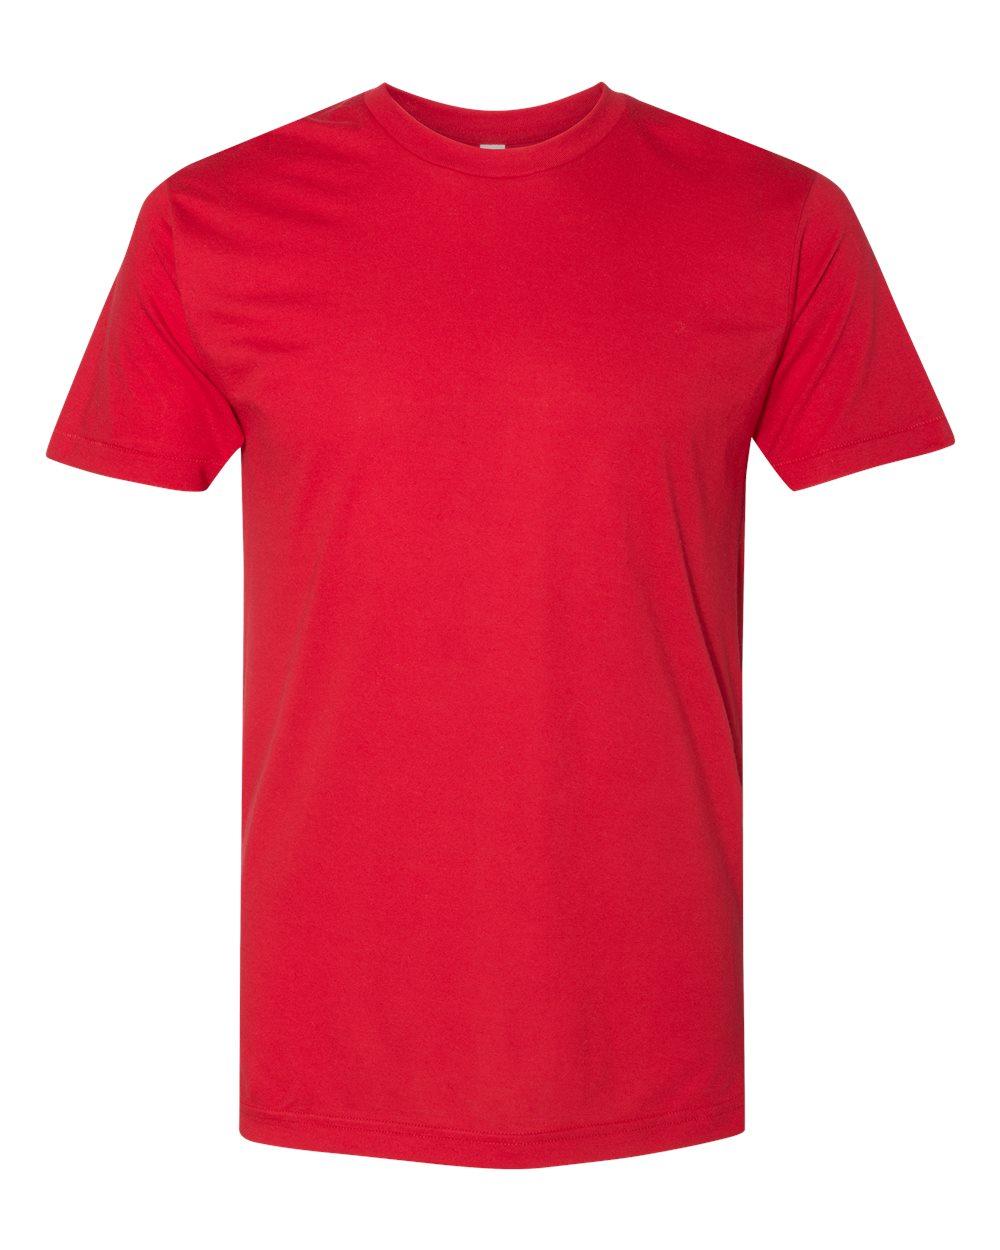 American-Apparel-Mens-Slim-Fit-50-50-Cotton-T-Shirt-Tee-BB401W-up-to-2XL thumbnail 48